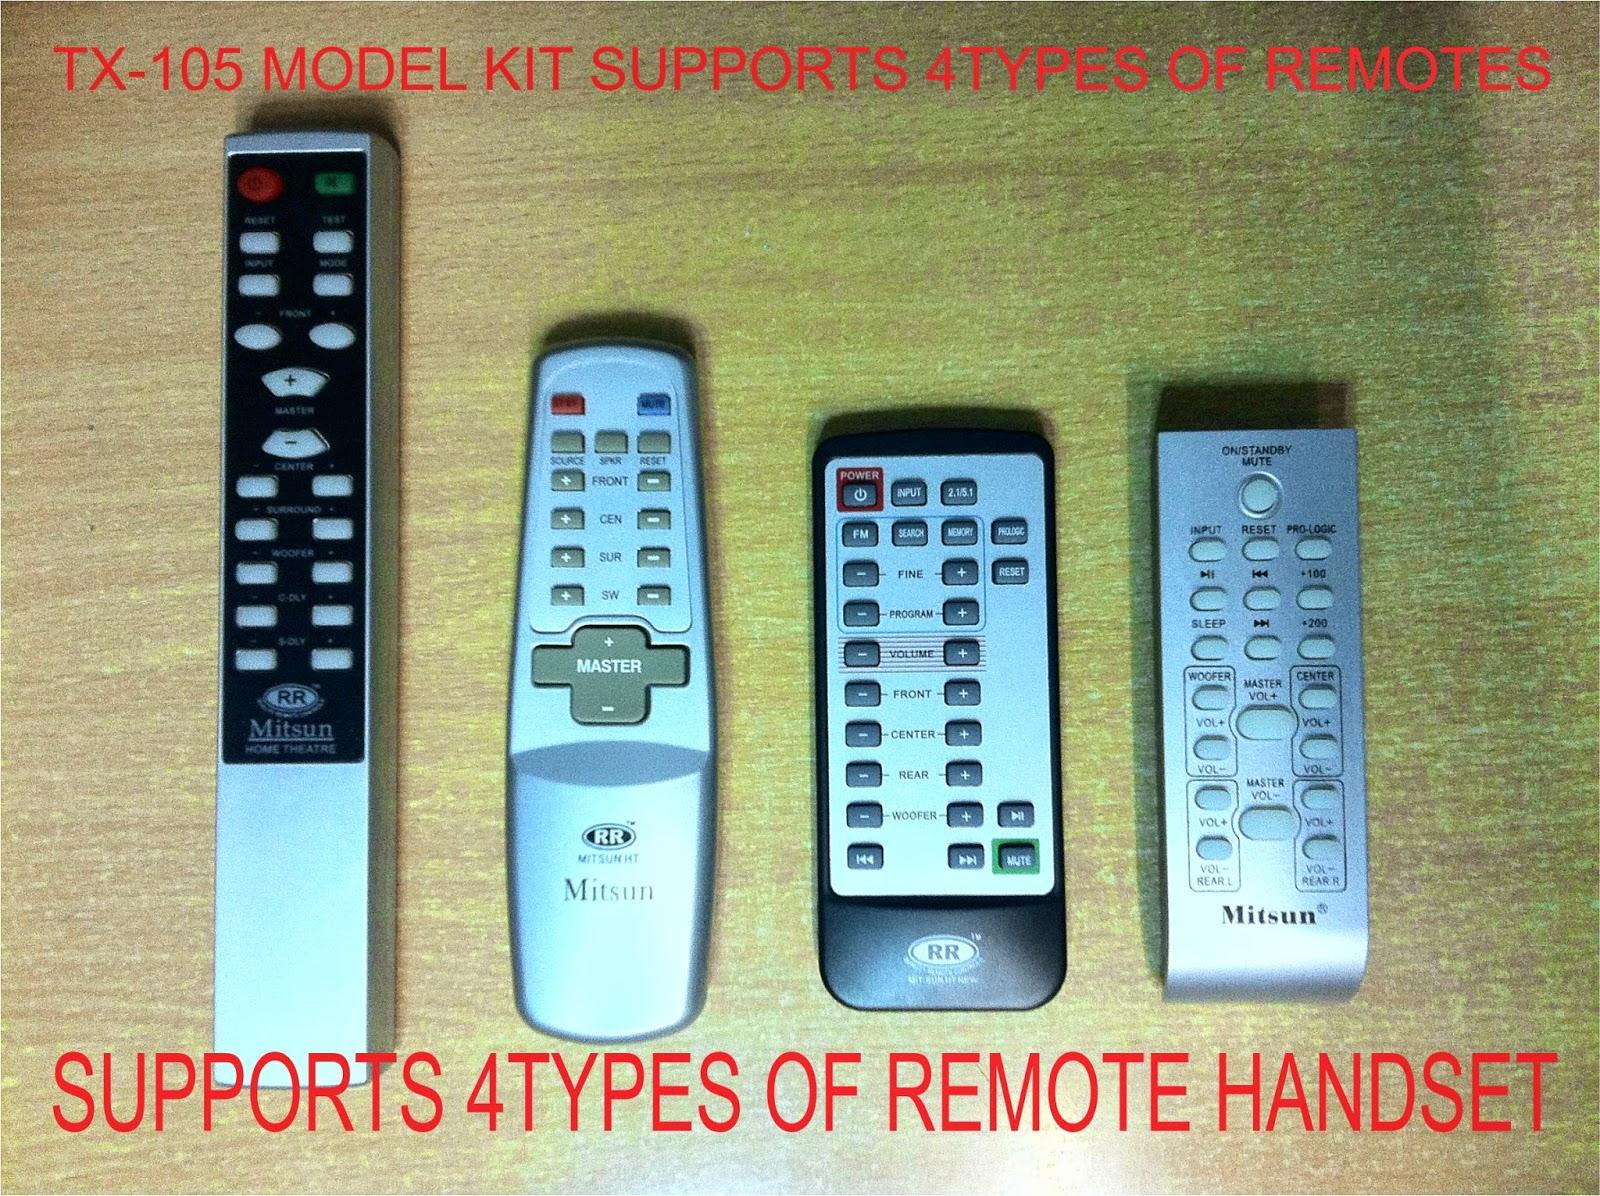 audio remote kit: 5.1 channel audio remote kit